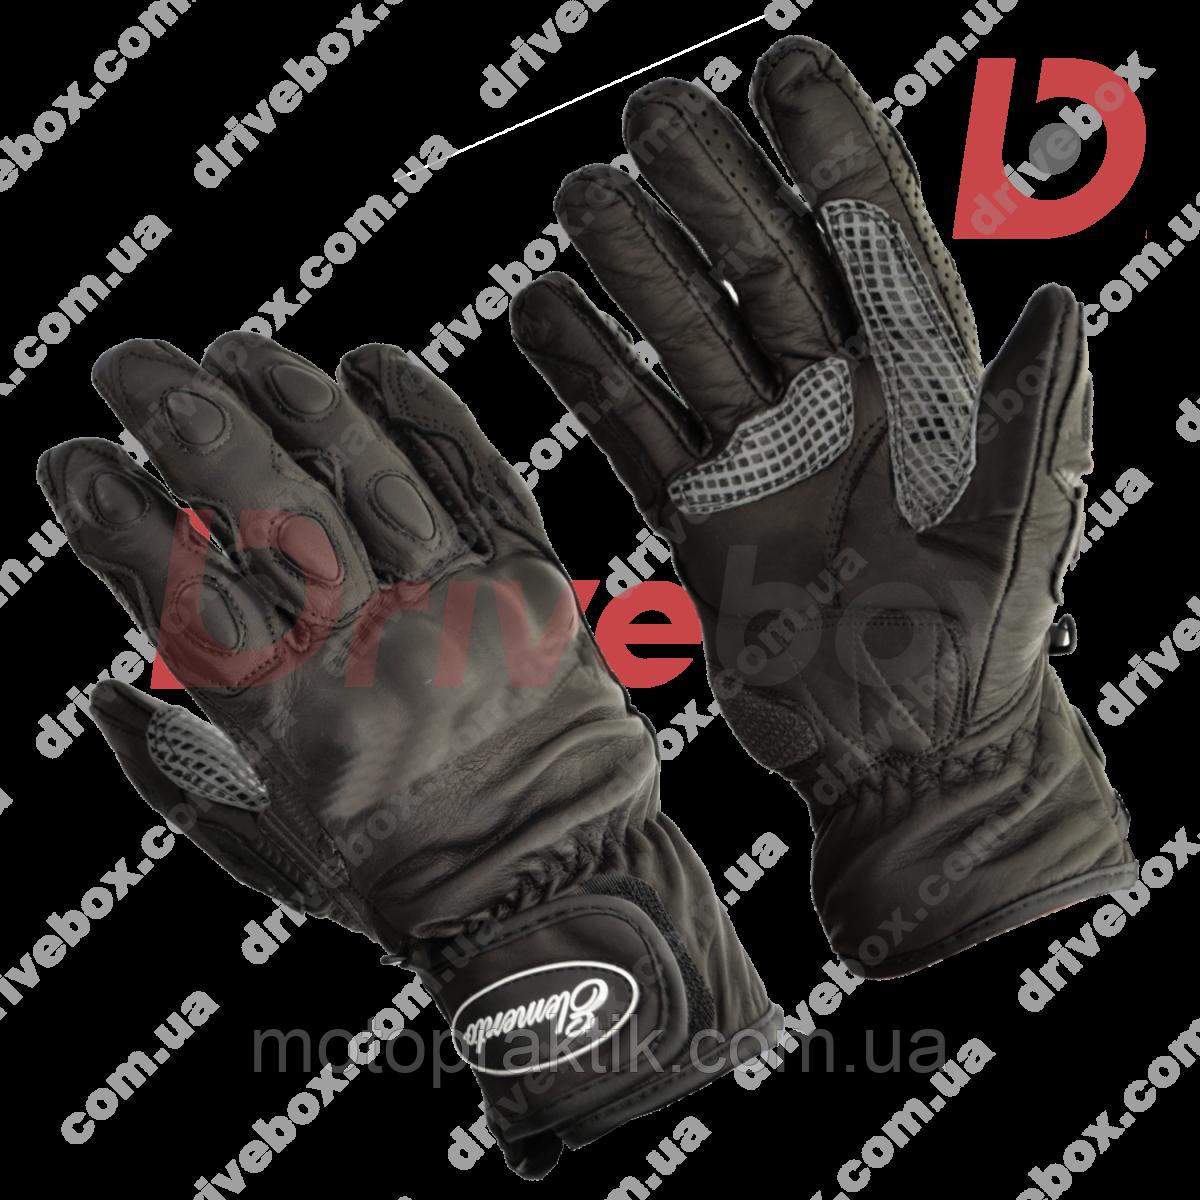 Elemento 175 Road Gloves Black, L Мотоперчатки дорожні